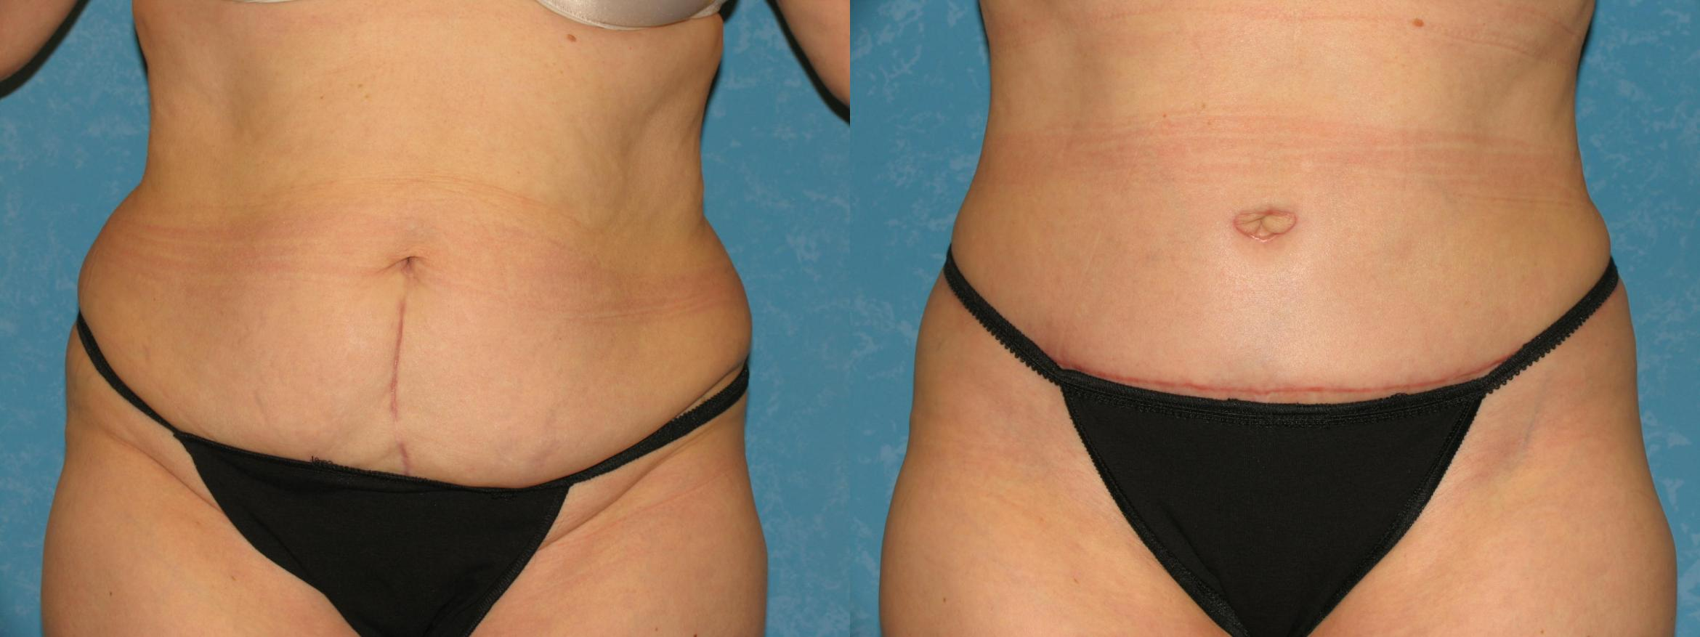 Tummy Tuck Abdominoplasty In Toledo Ohio Dr Craig Colville